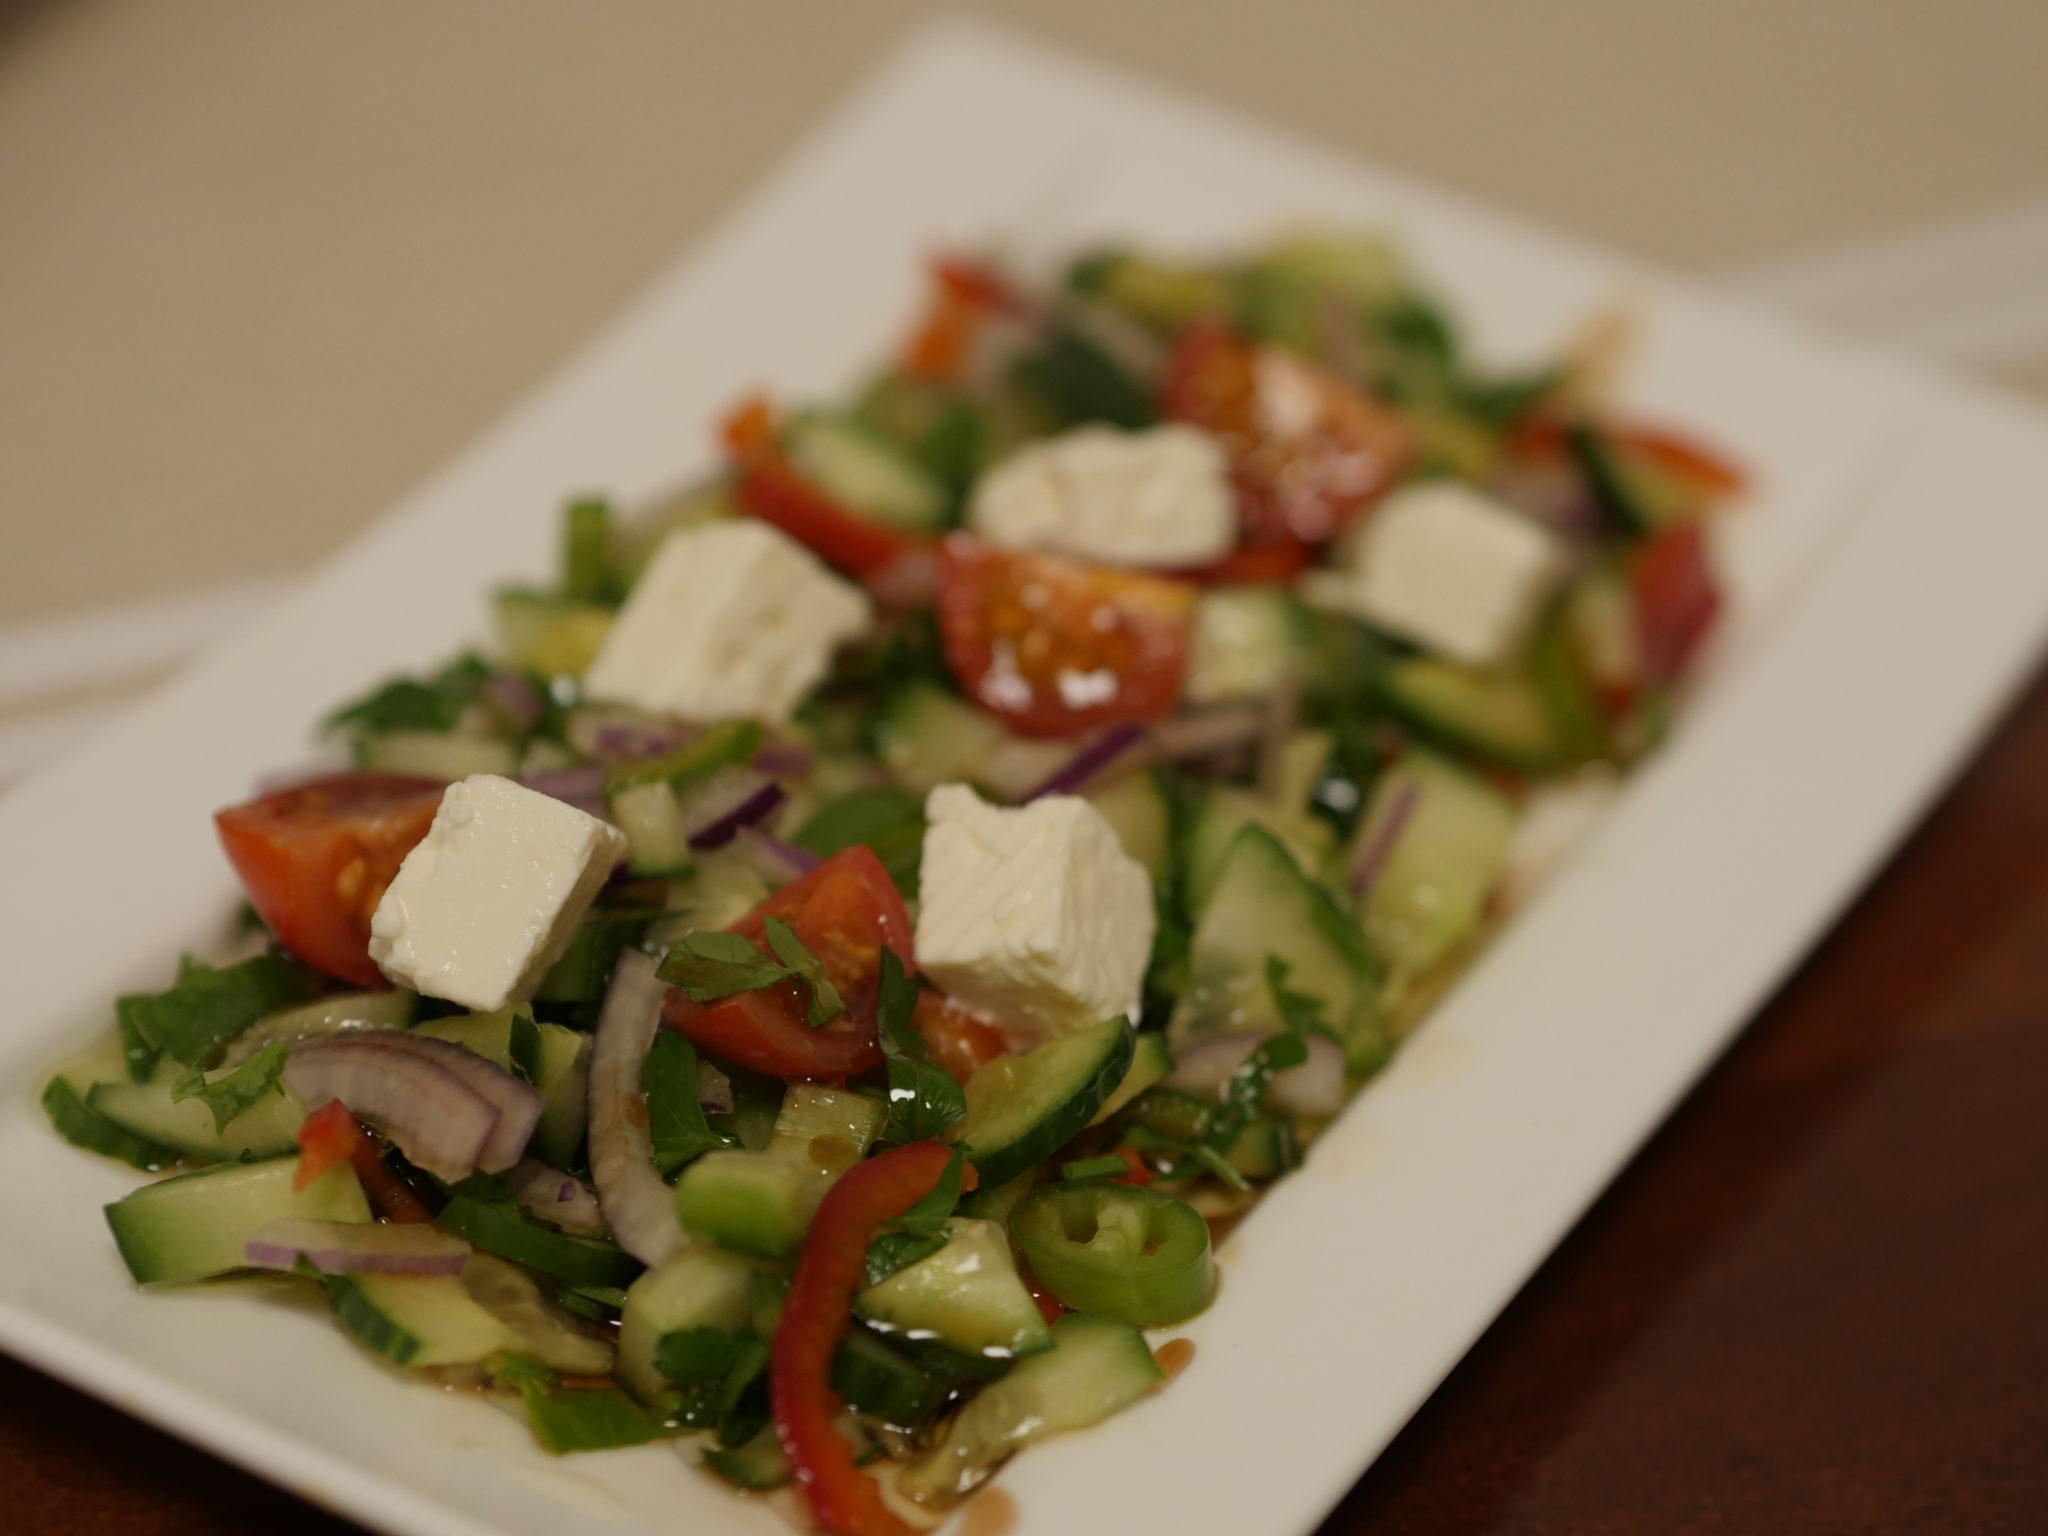 Culinary delight